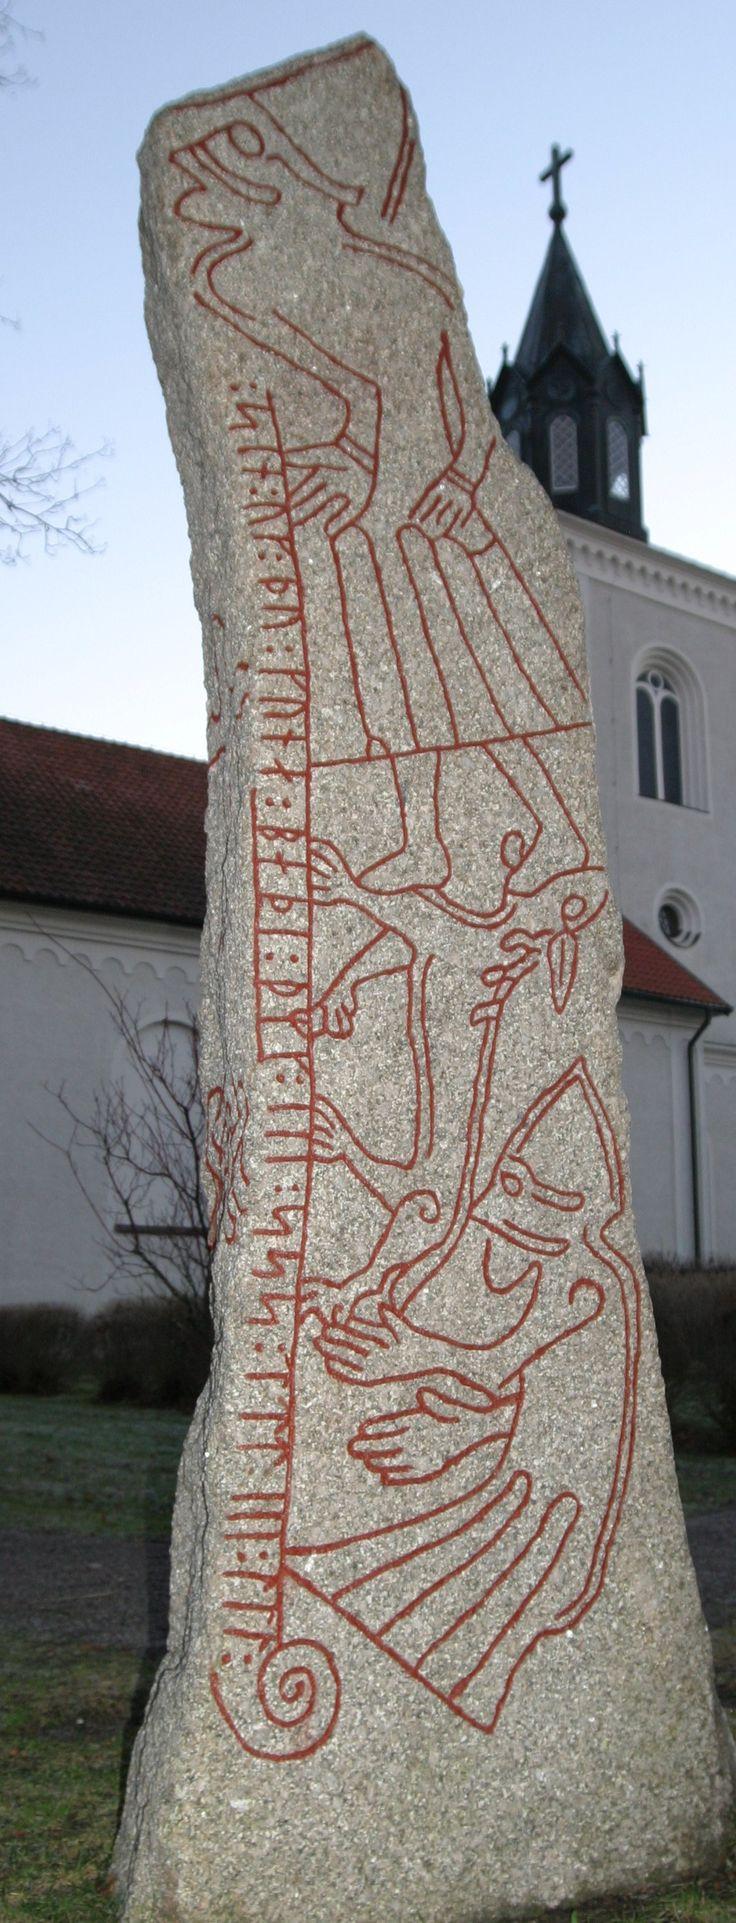 The Ledberg Runestone...THE ORIGINS OF RUNES